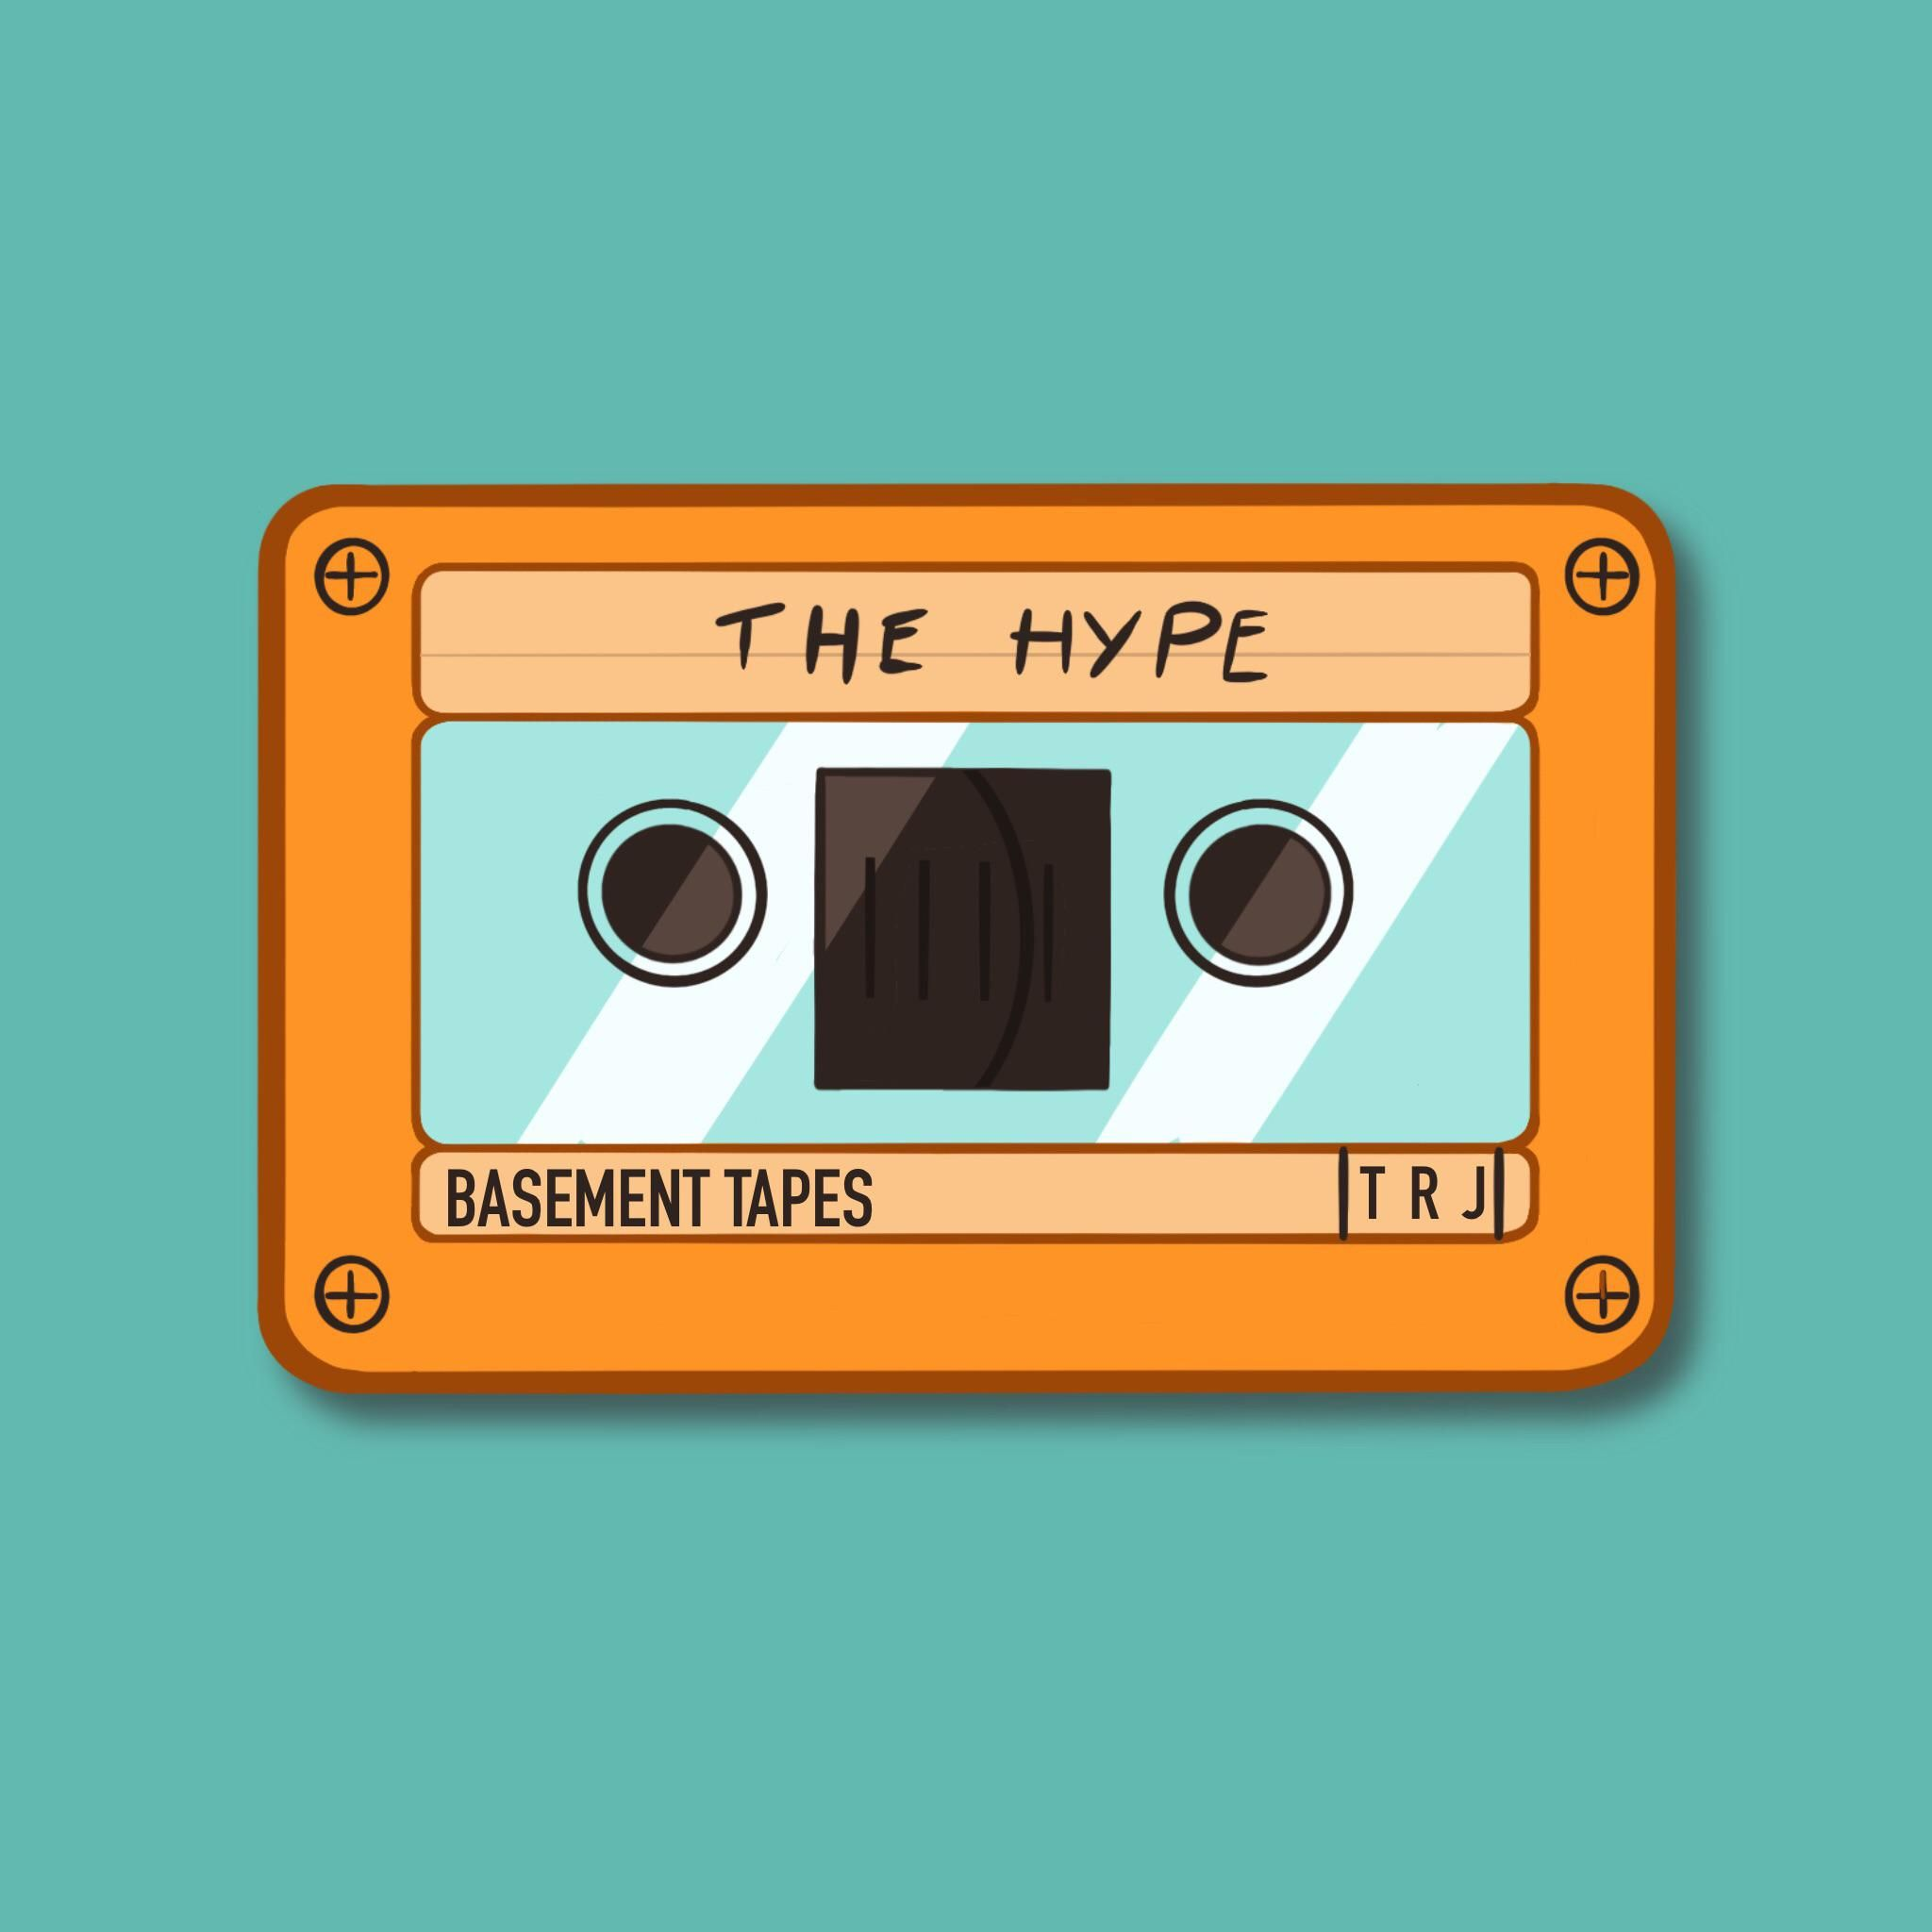 the hype basement tapes twentyonepilots Twenty one